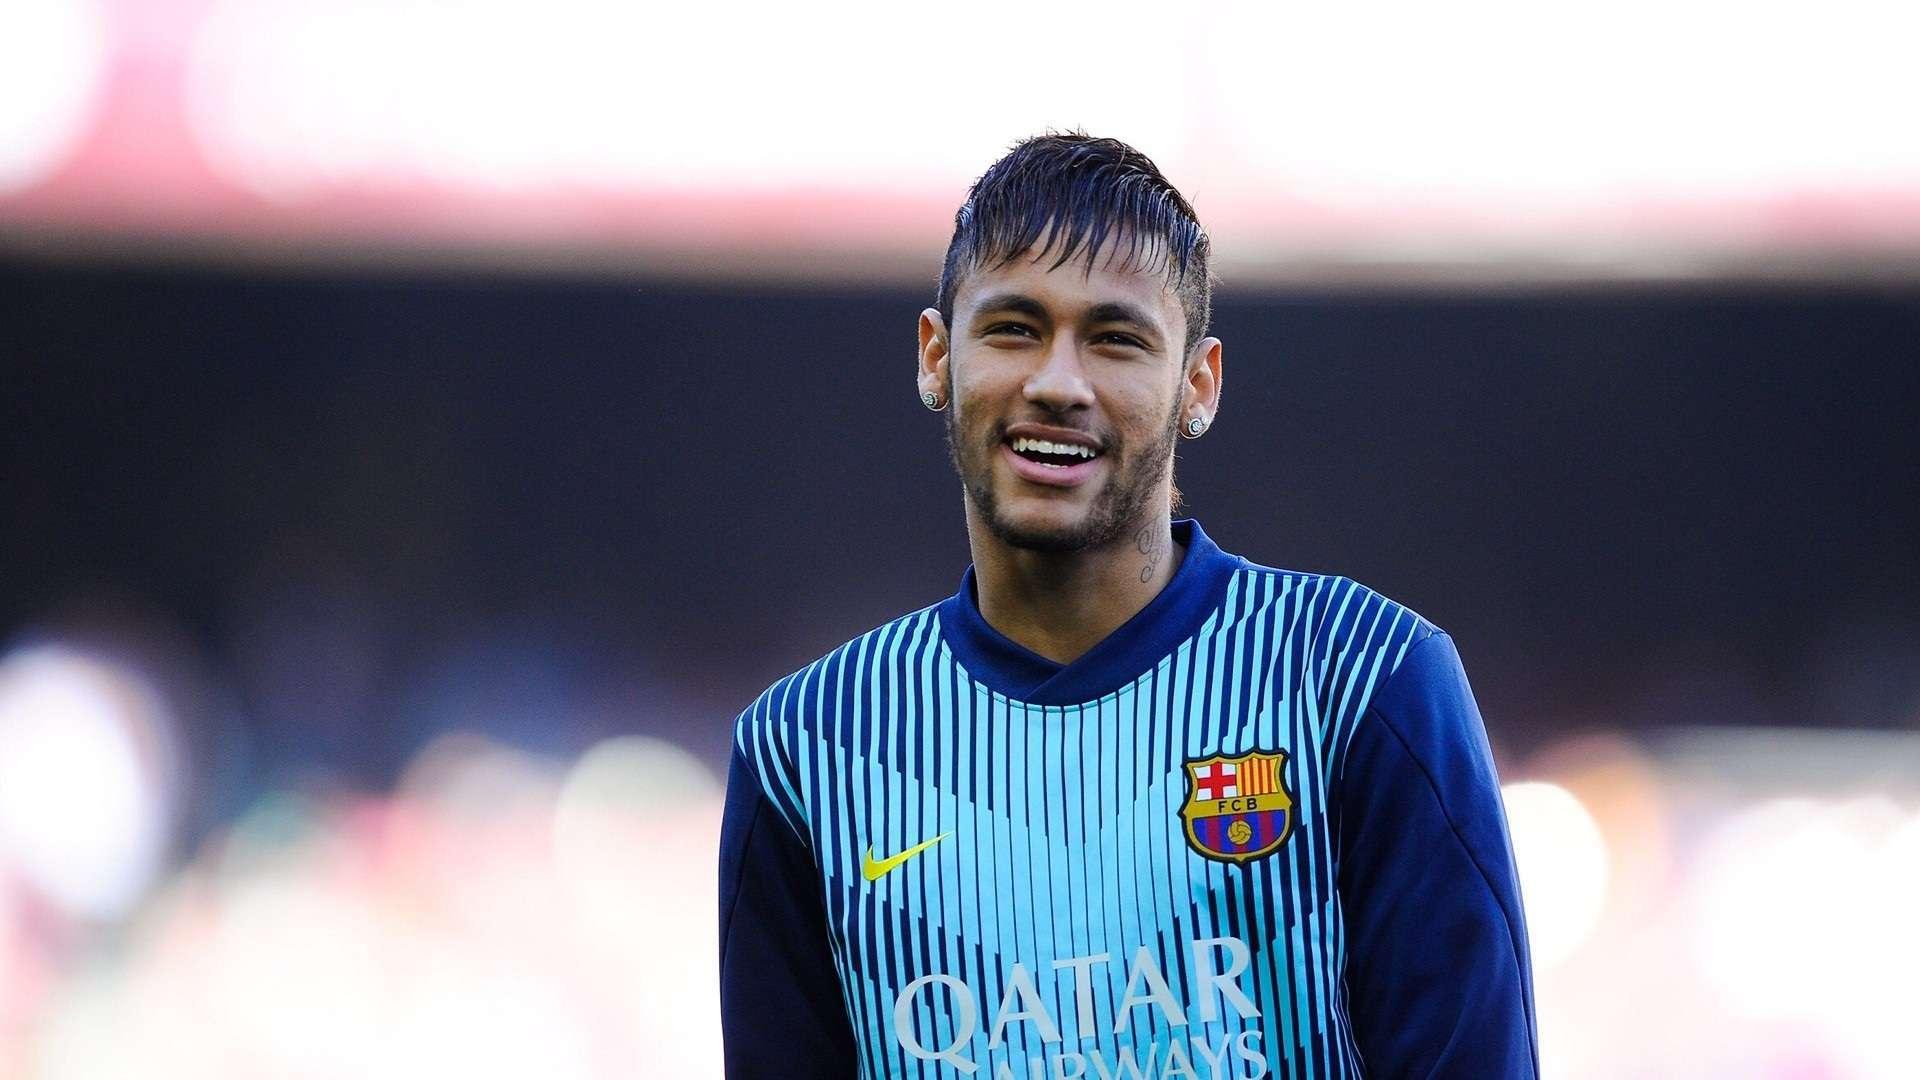 Hd wallpaper neymar - Neymar Jr Hd Images